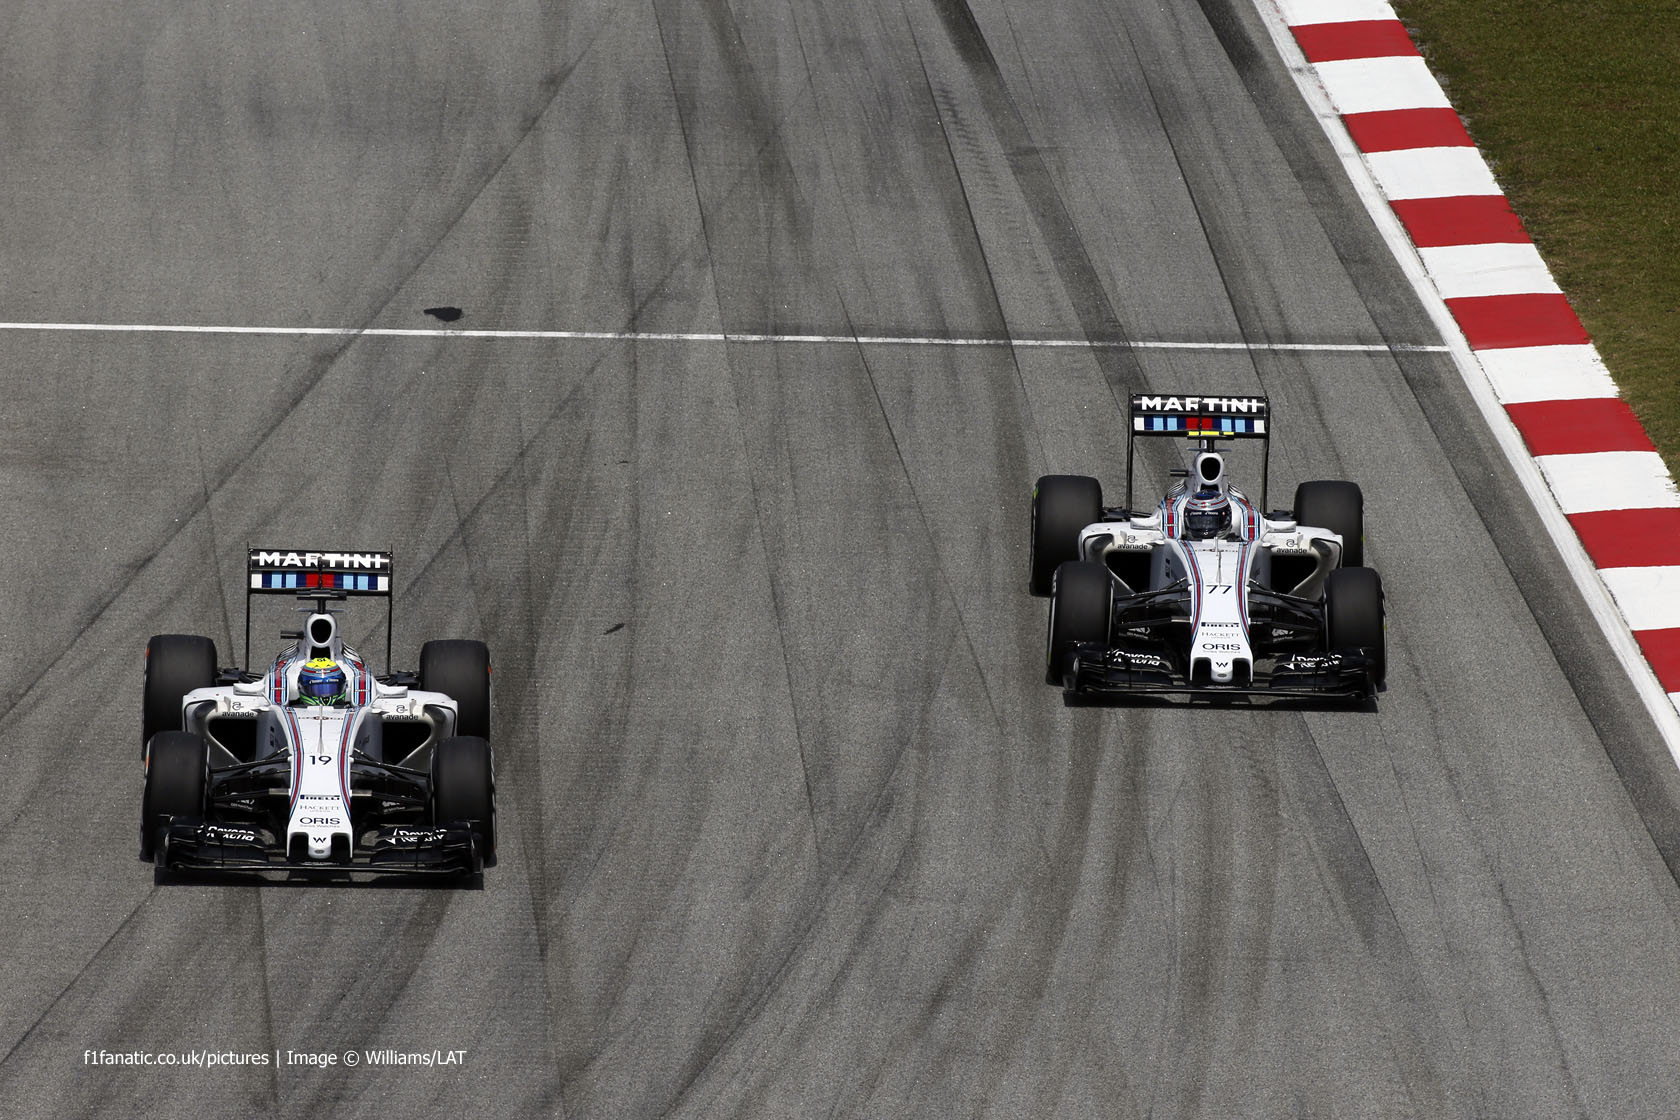 Felipe Massa, Valtteri Bottas, Williams, Sepang International Circuit, 2015